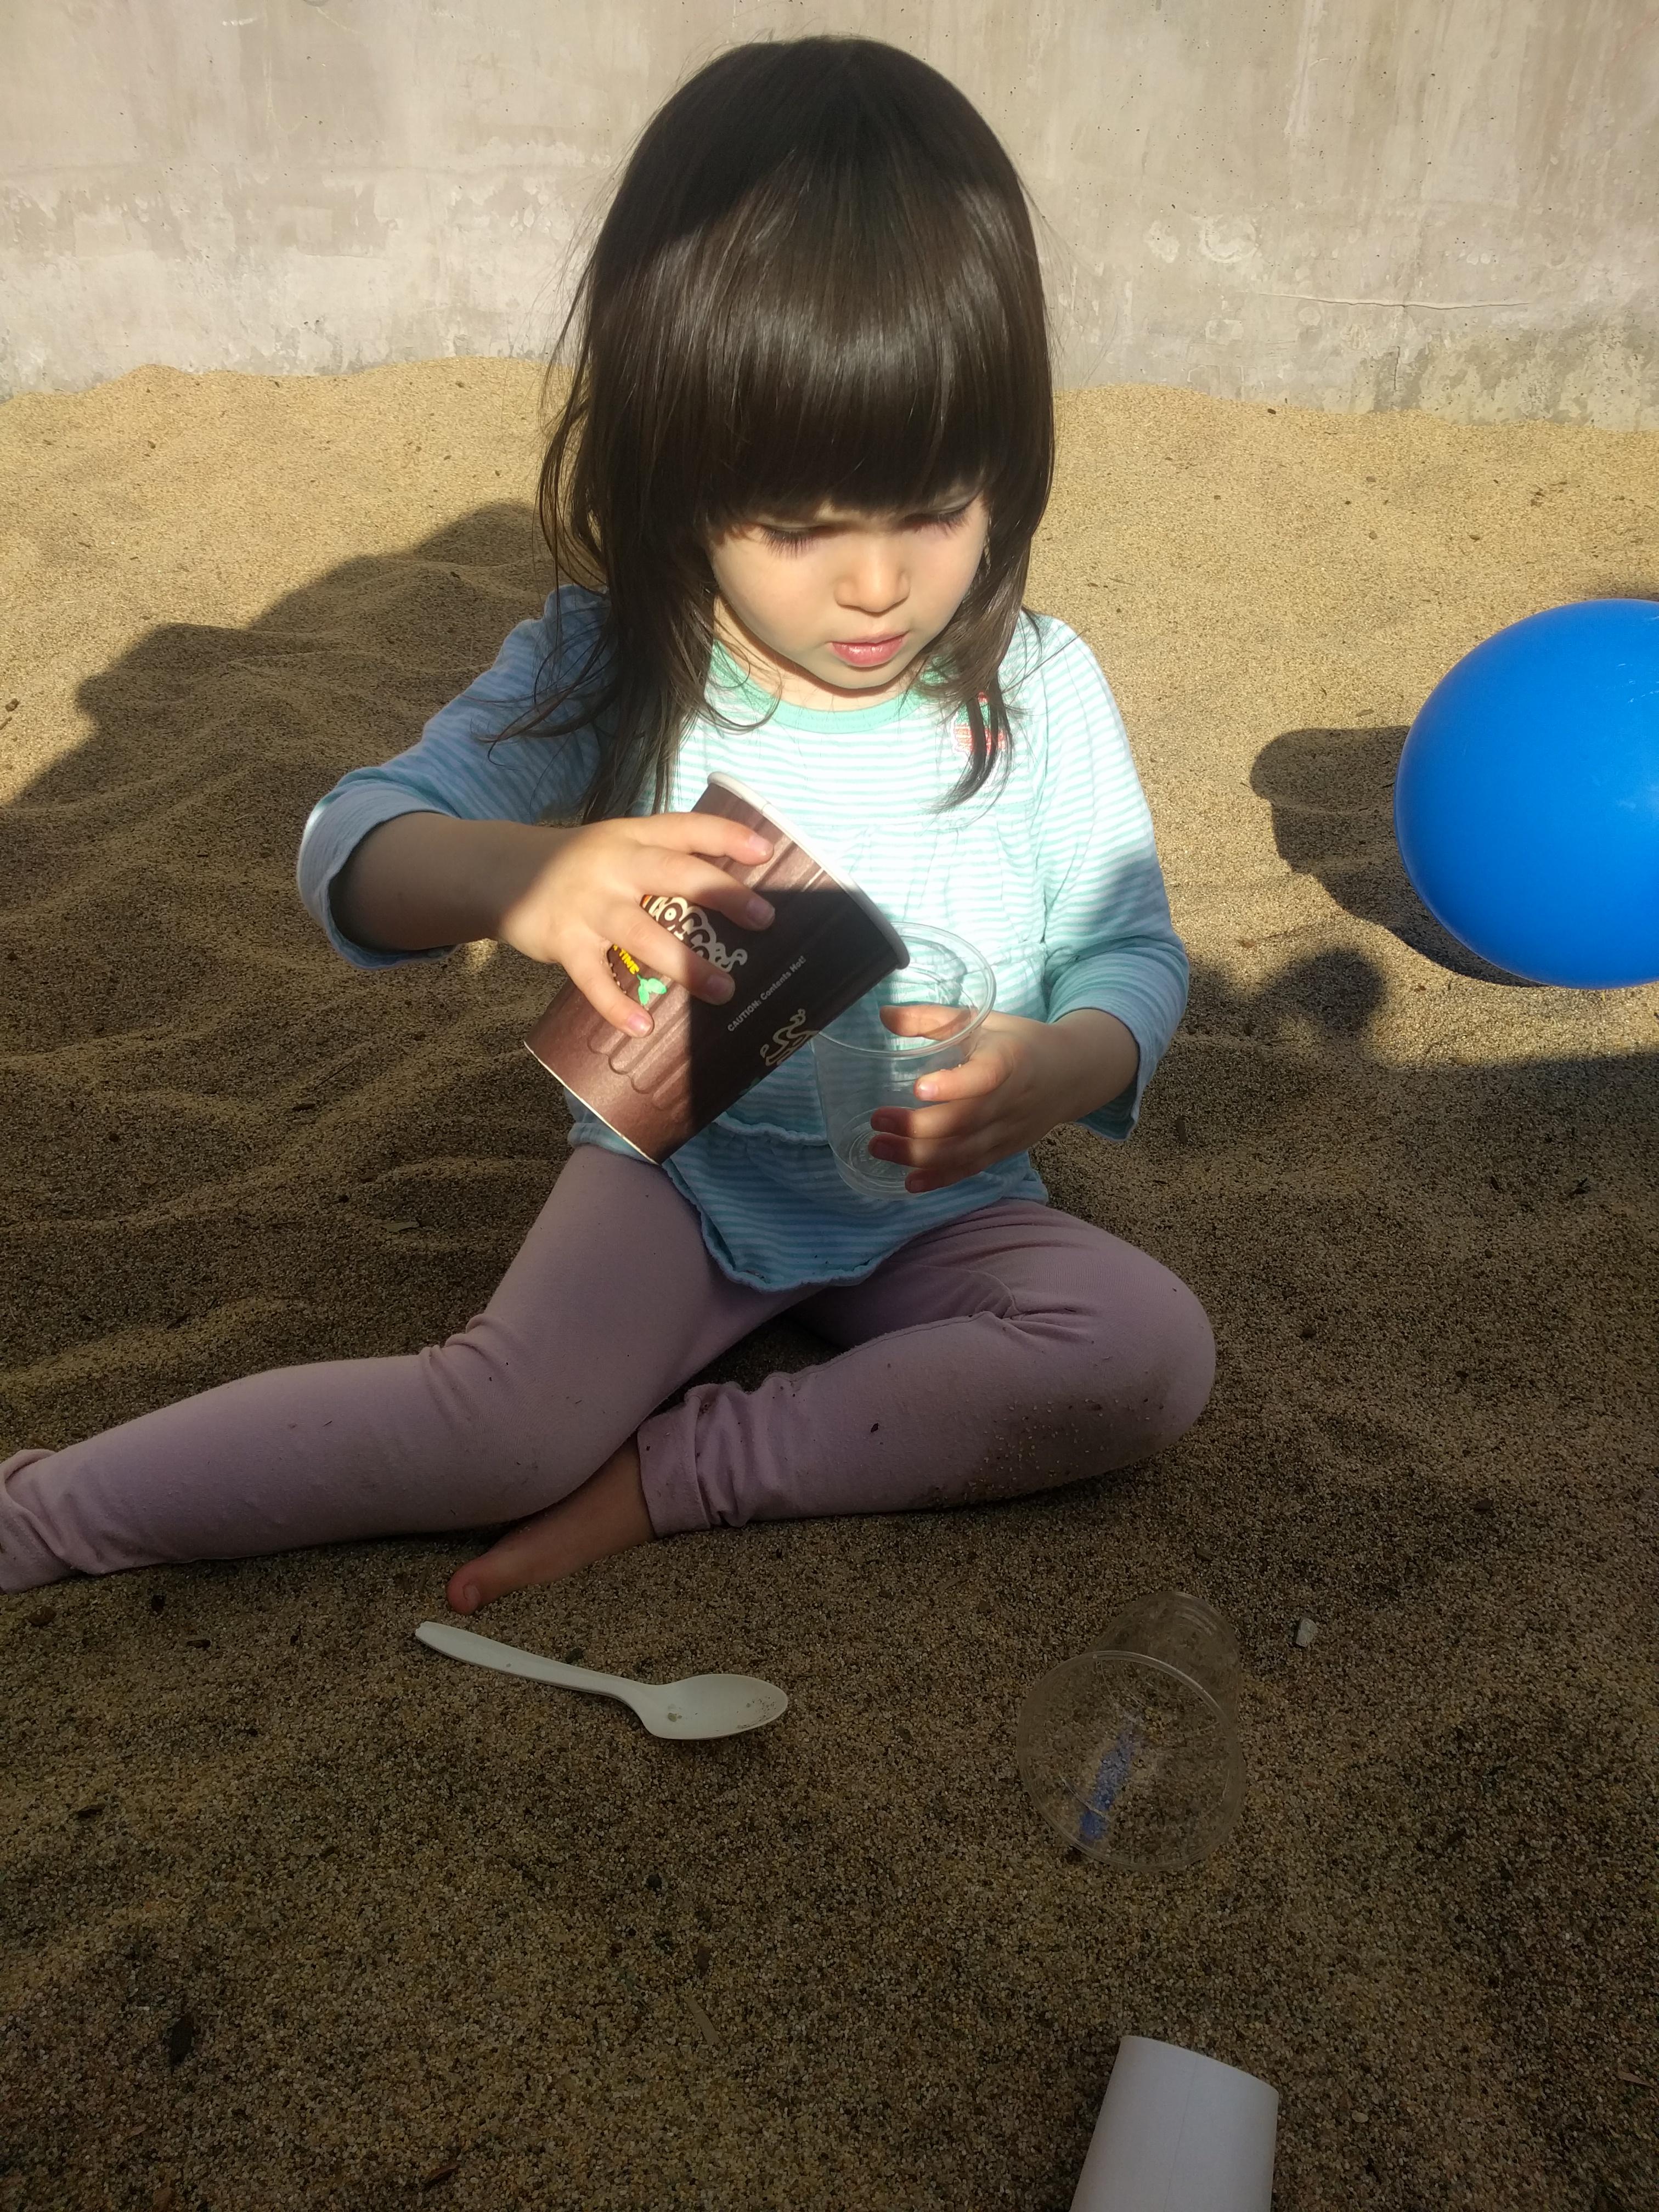 playground_sandbox_pouring